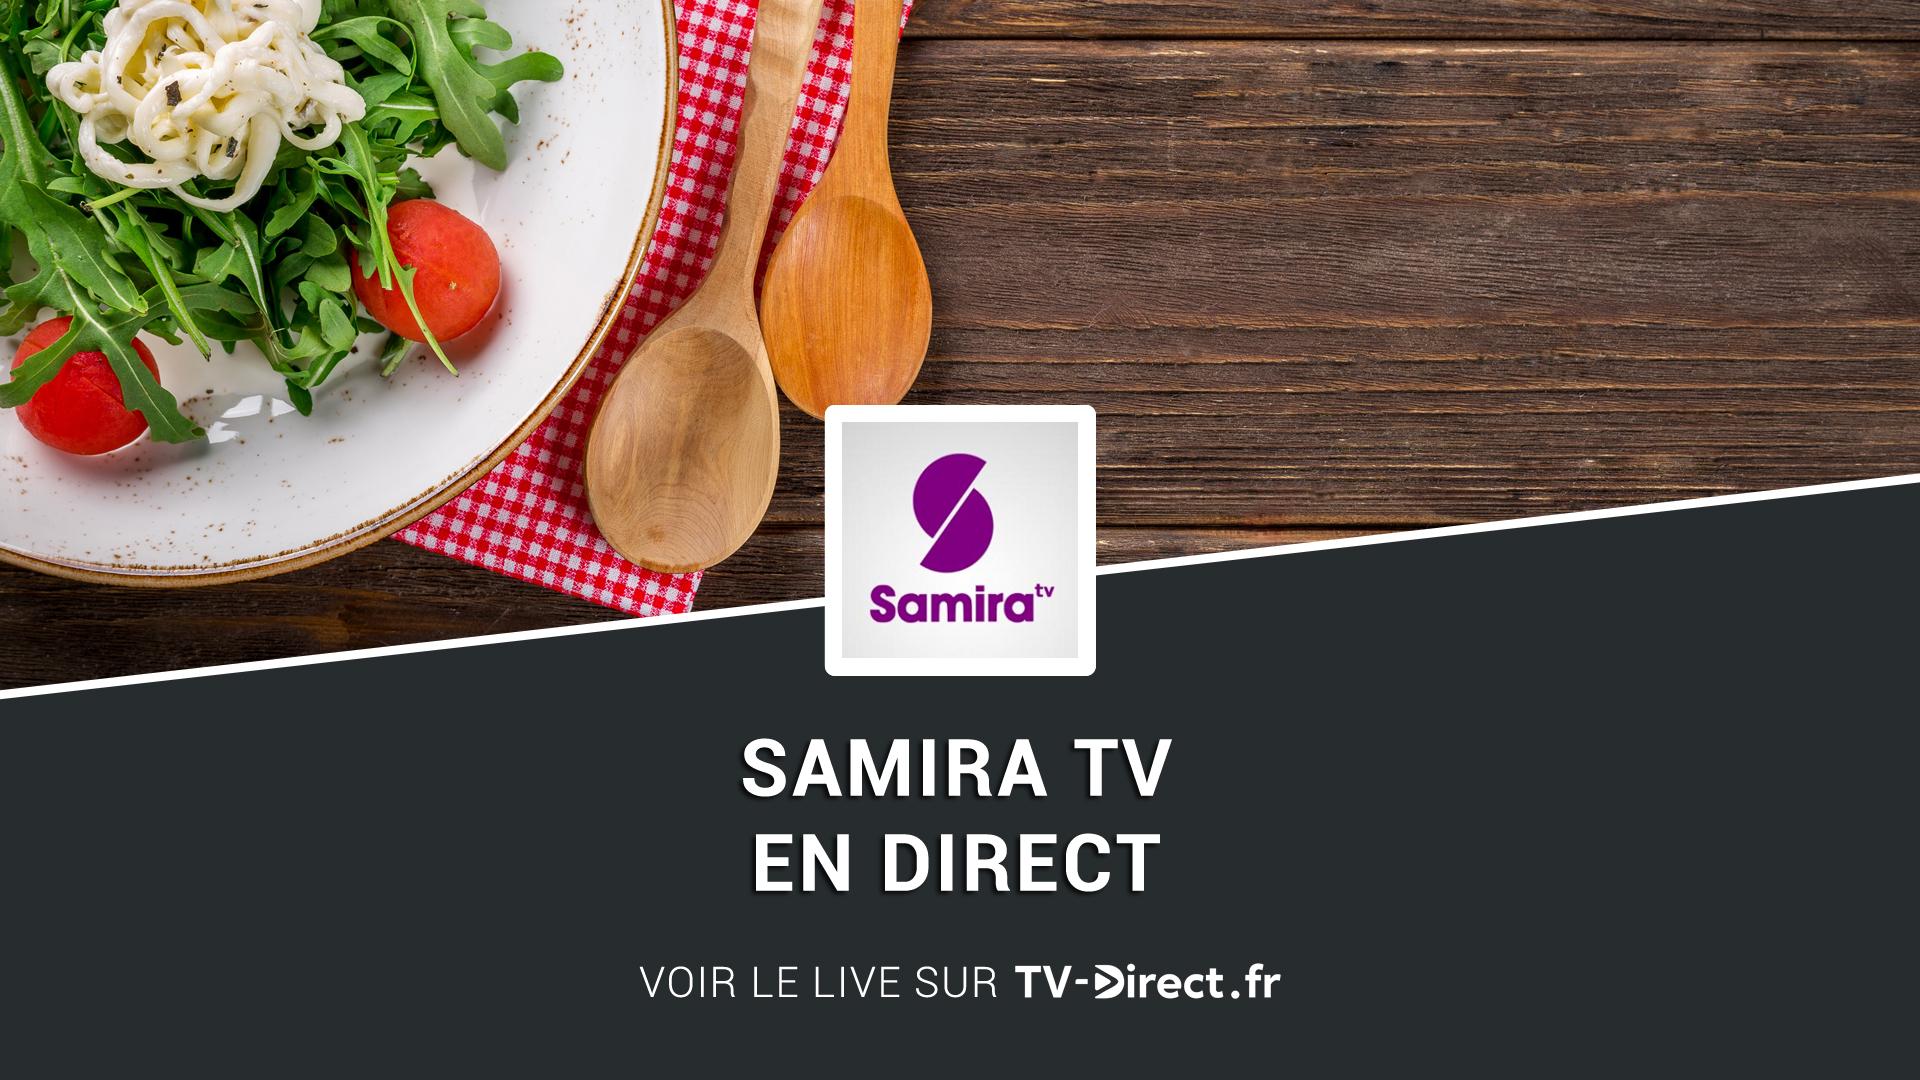 Samira Tv Direct Regarder Samira Tv En Direct Live Sur Internet